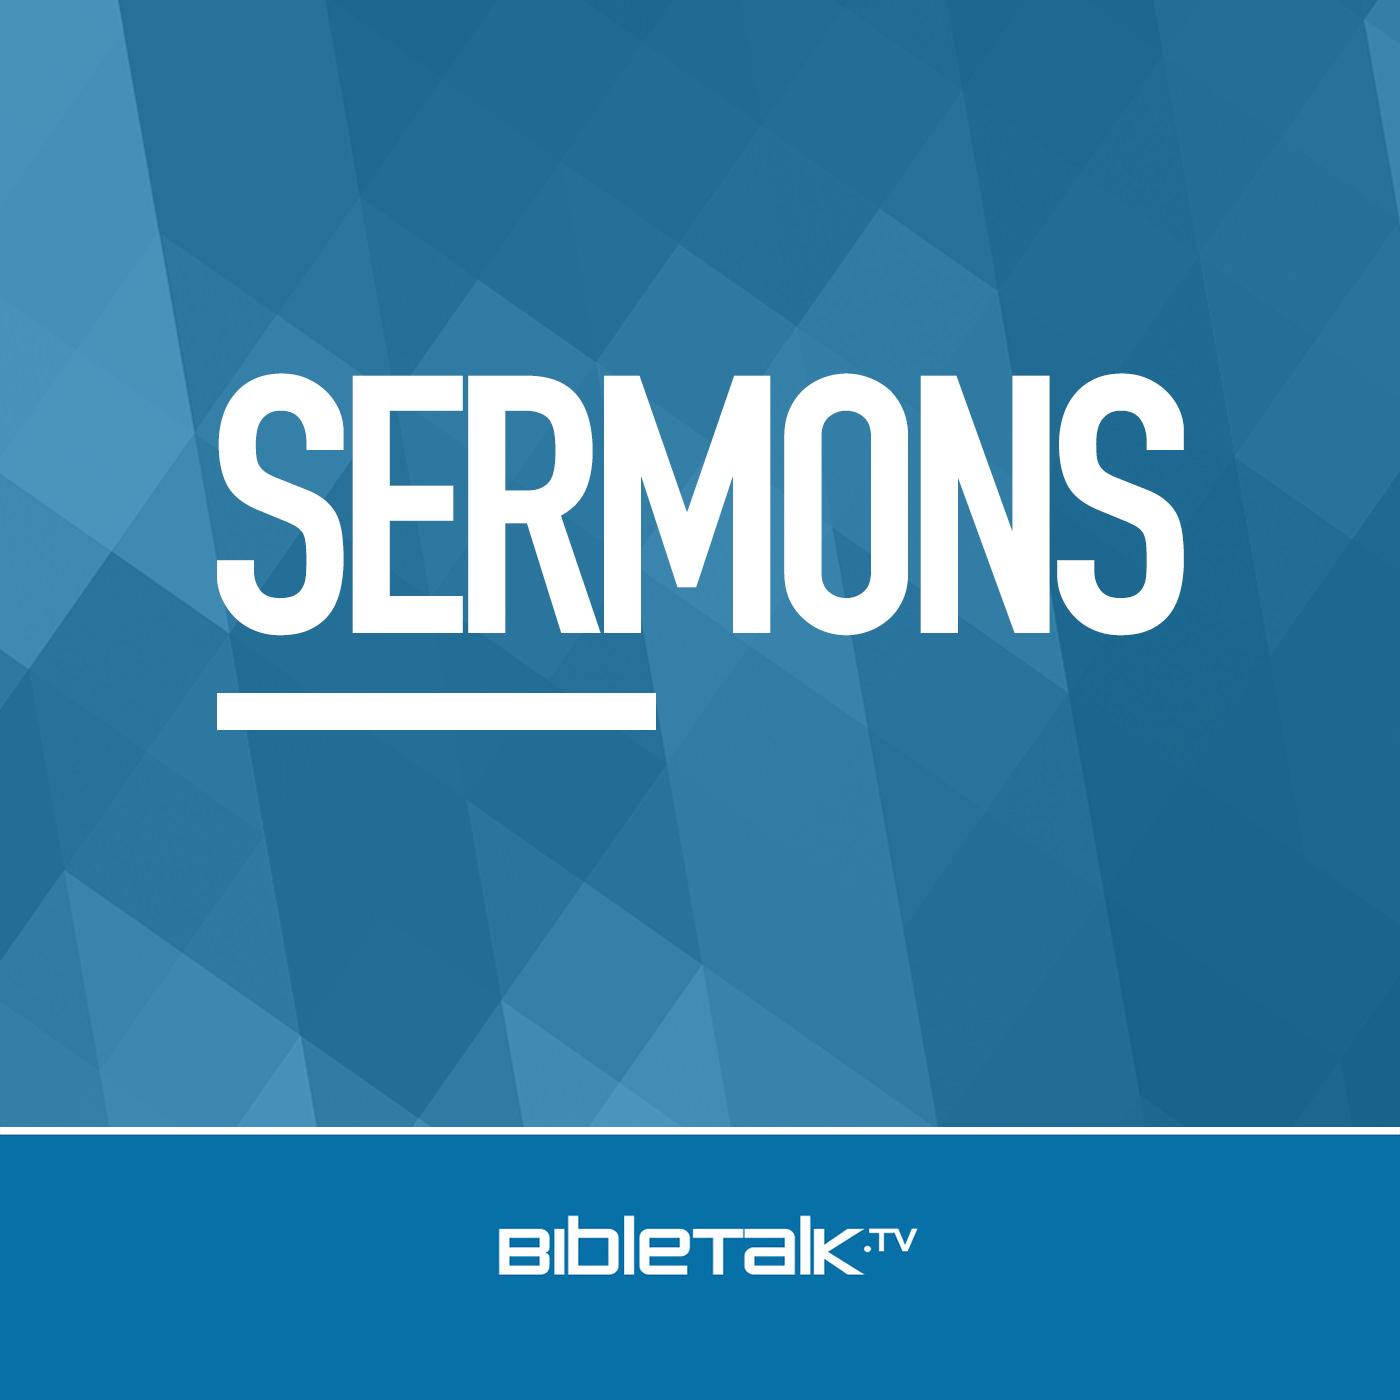 Christian Podcasts - Sermons by Mike Mazzalongo